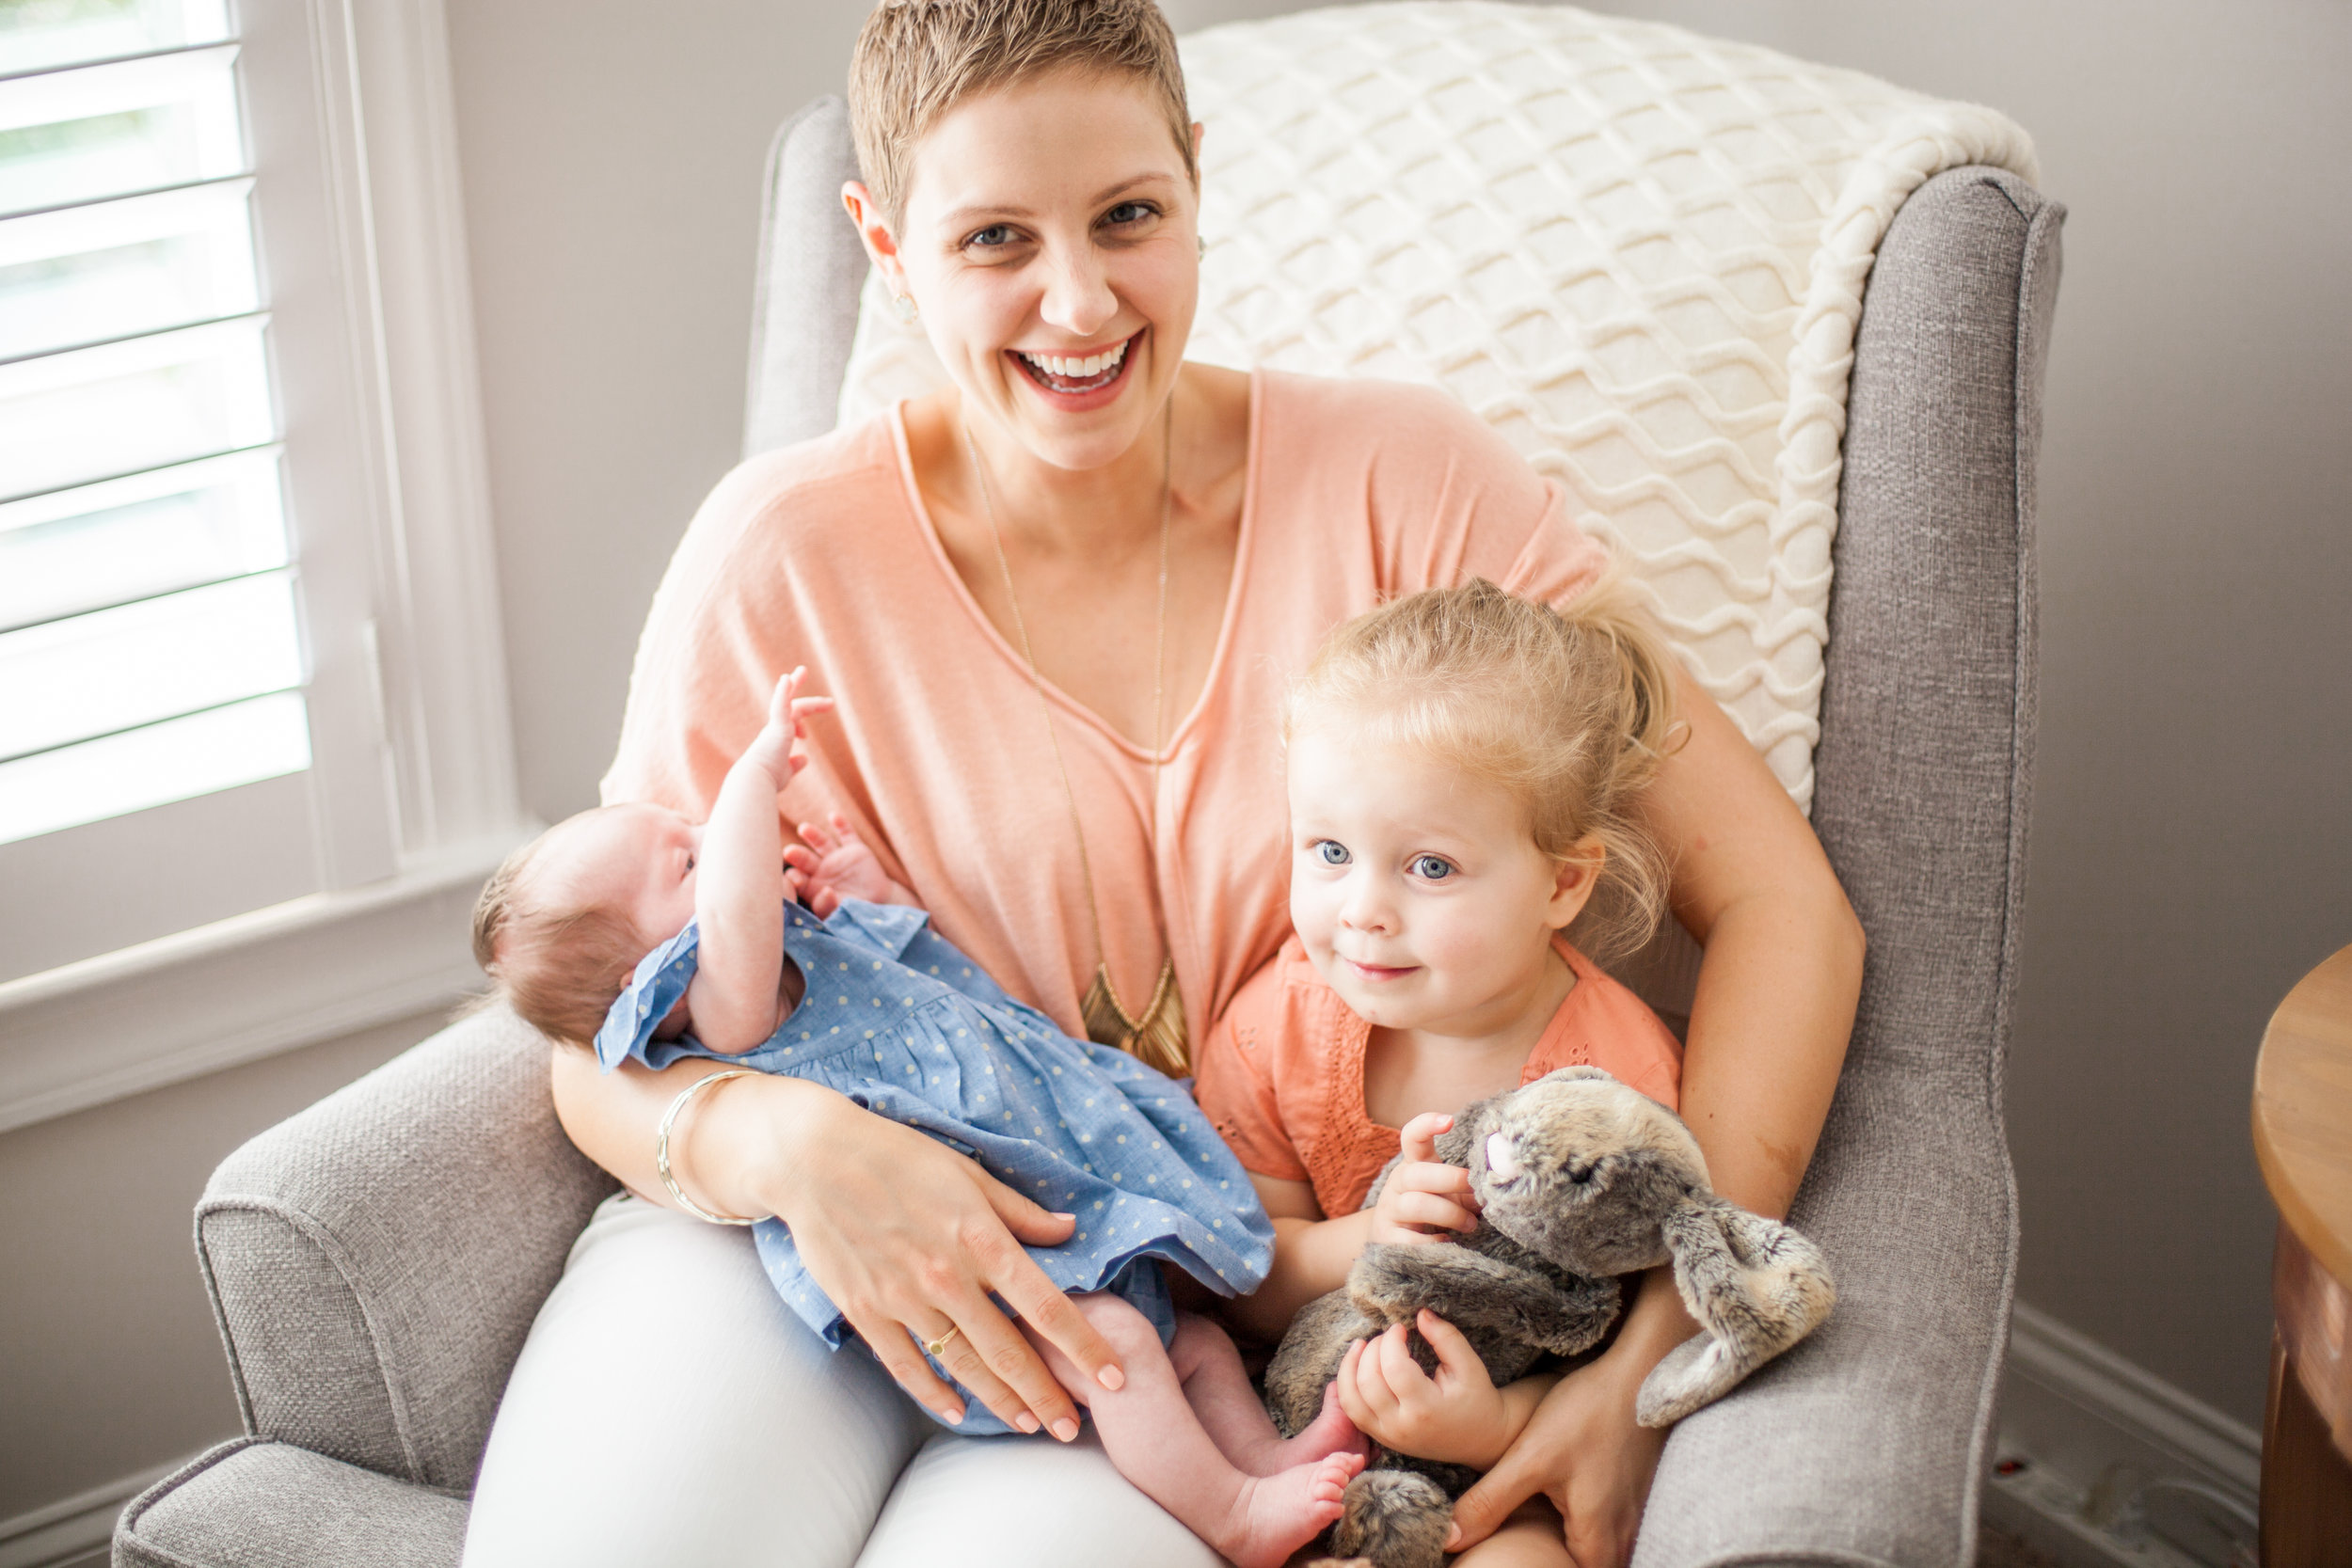 brookhaven-newborn-lifestyle-photography-with-sibling-angela-elliott-wingard-29.jpg